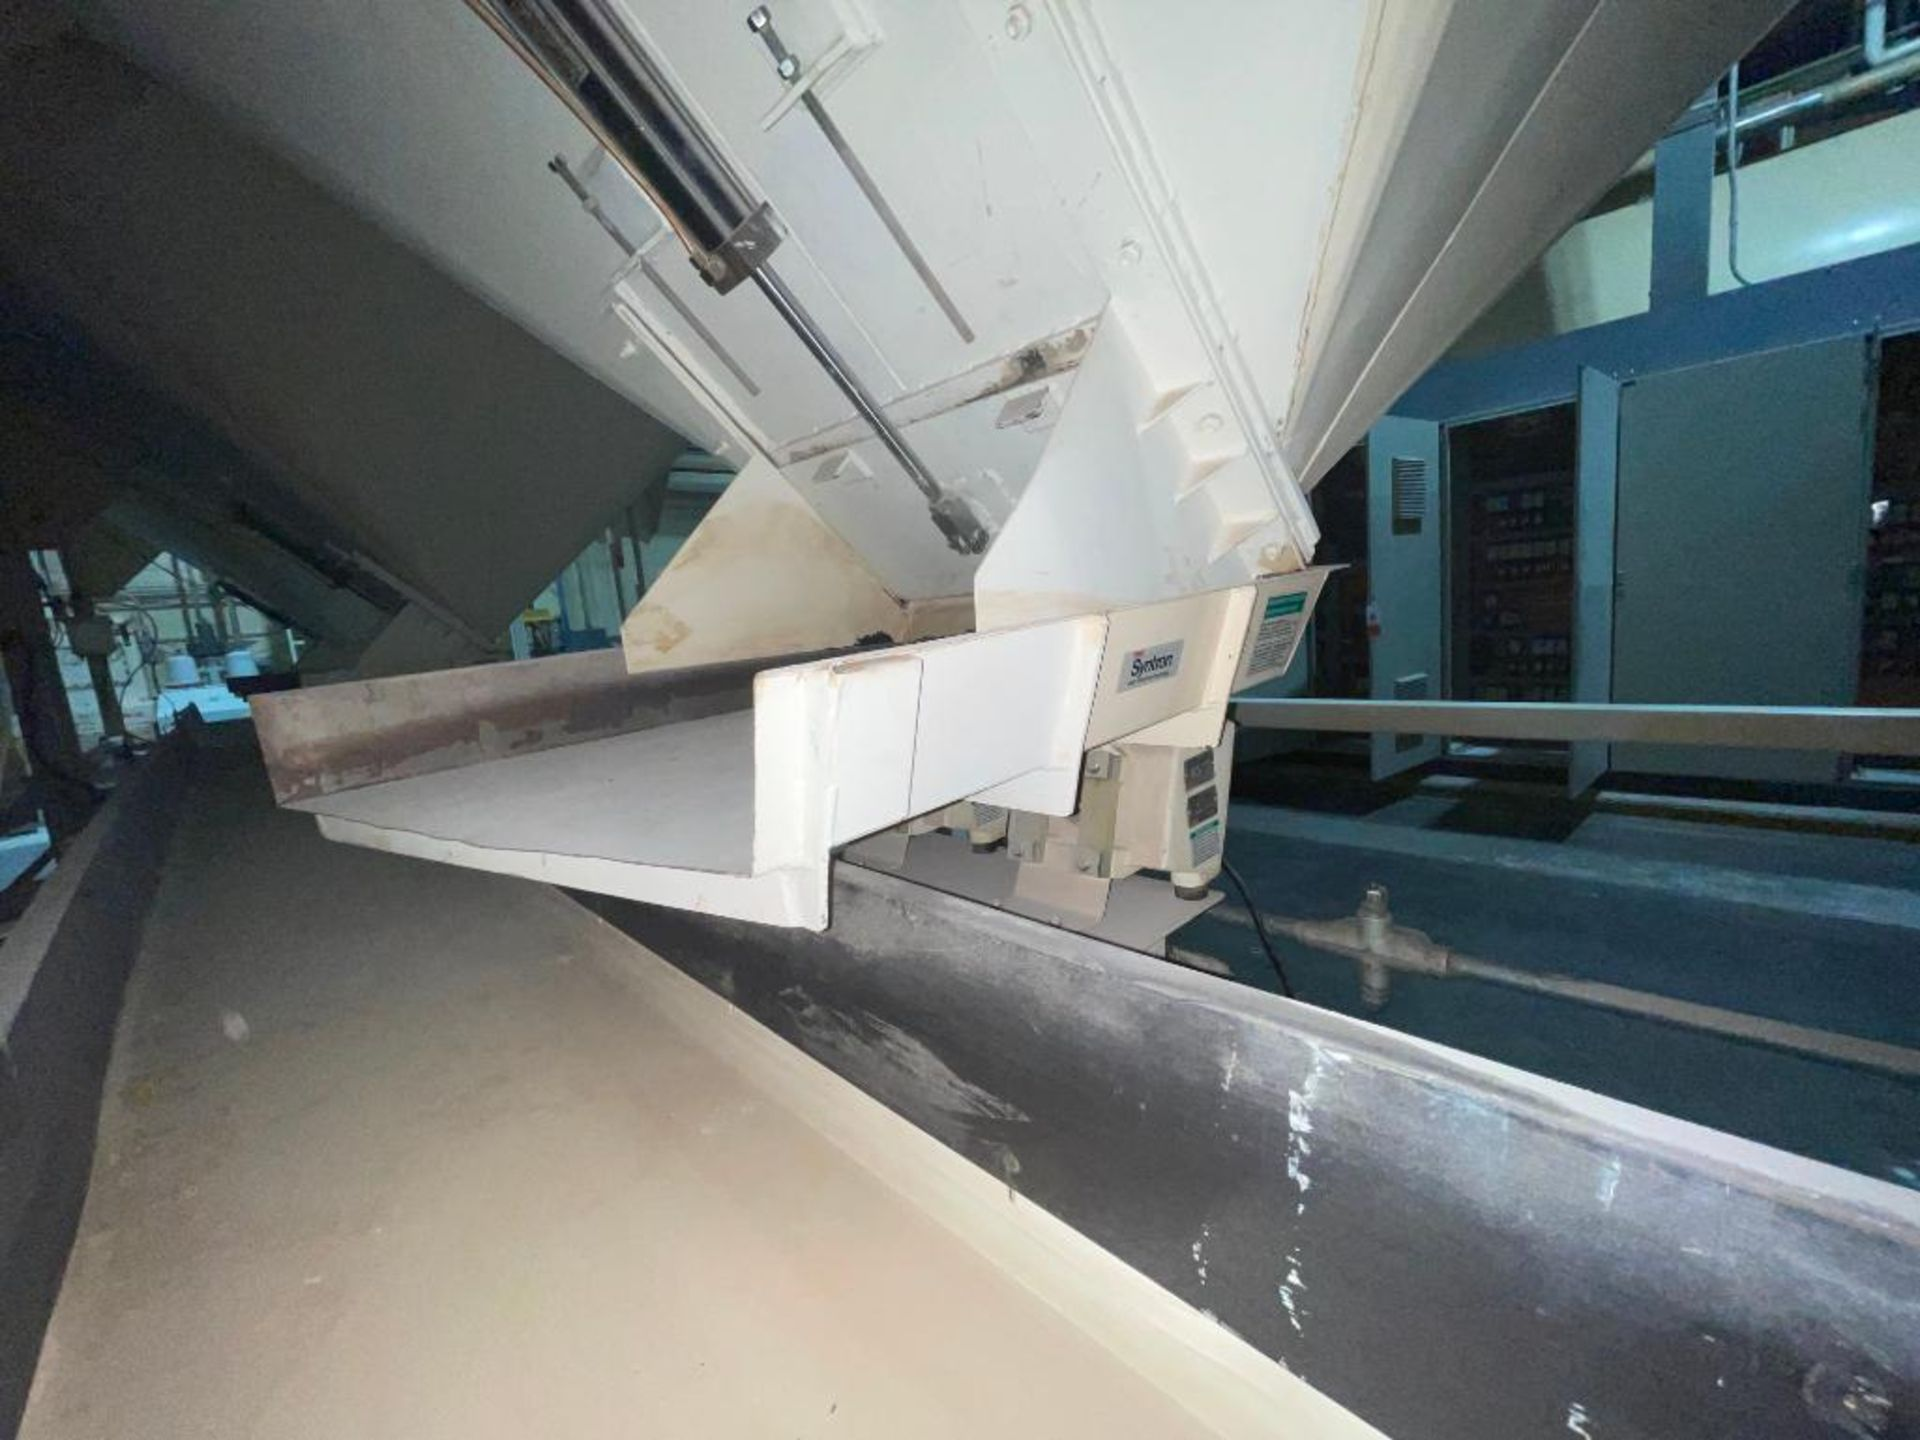 Aseeco mild steel cone bottom bulk storage bin - Image 23 of 28